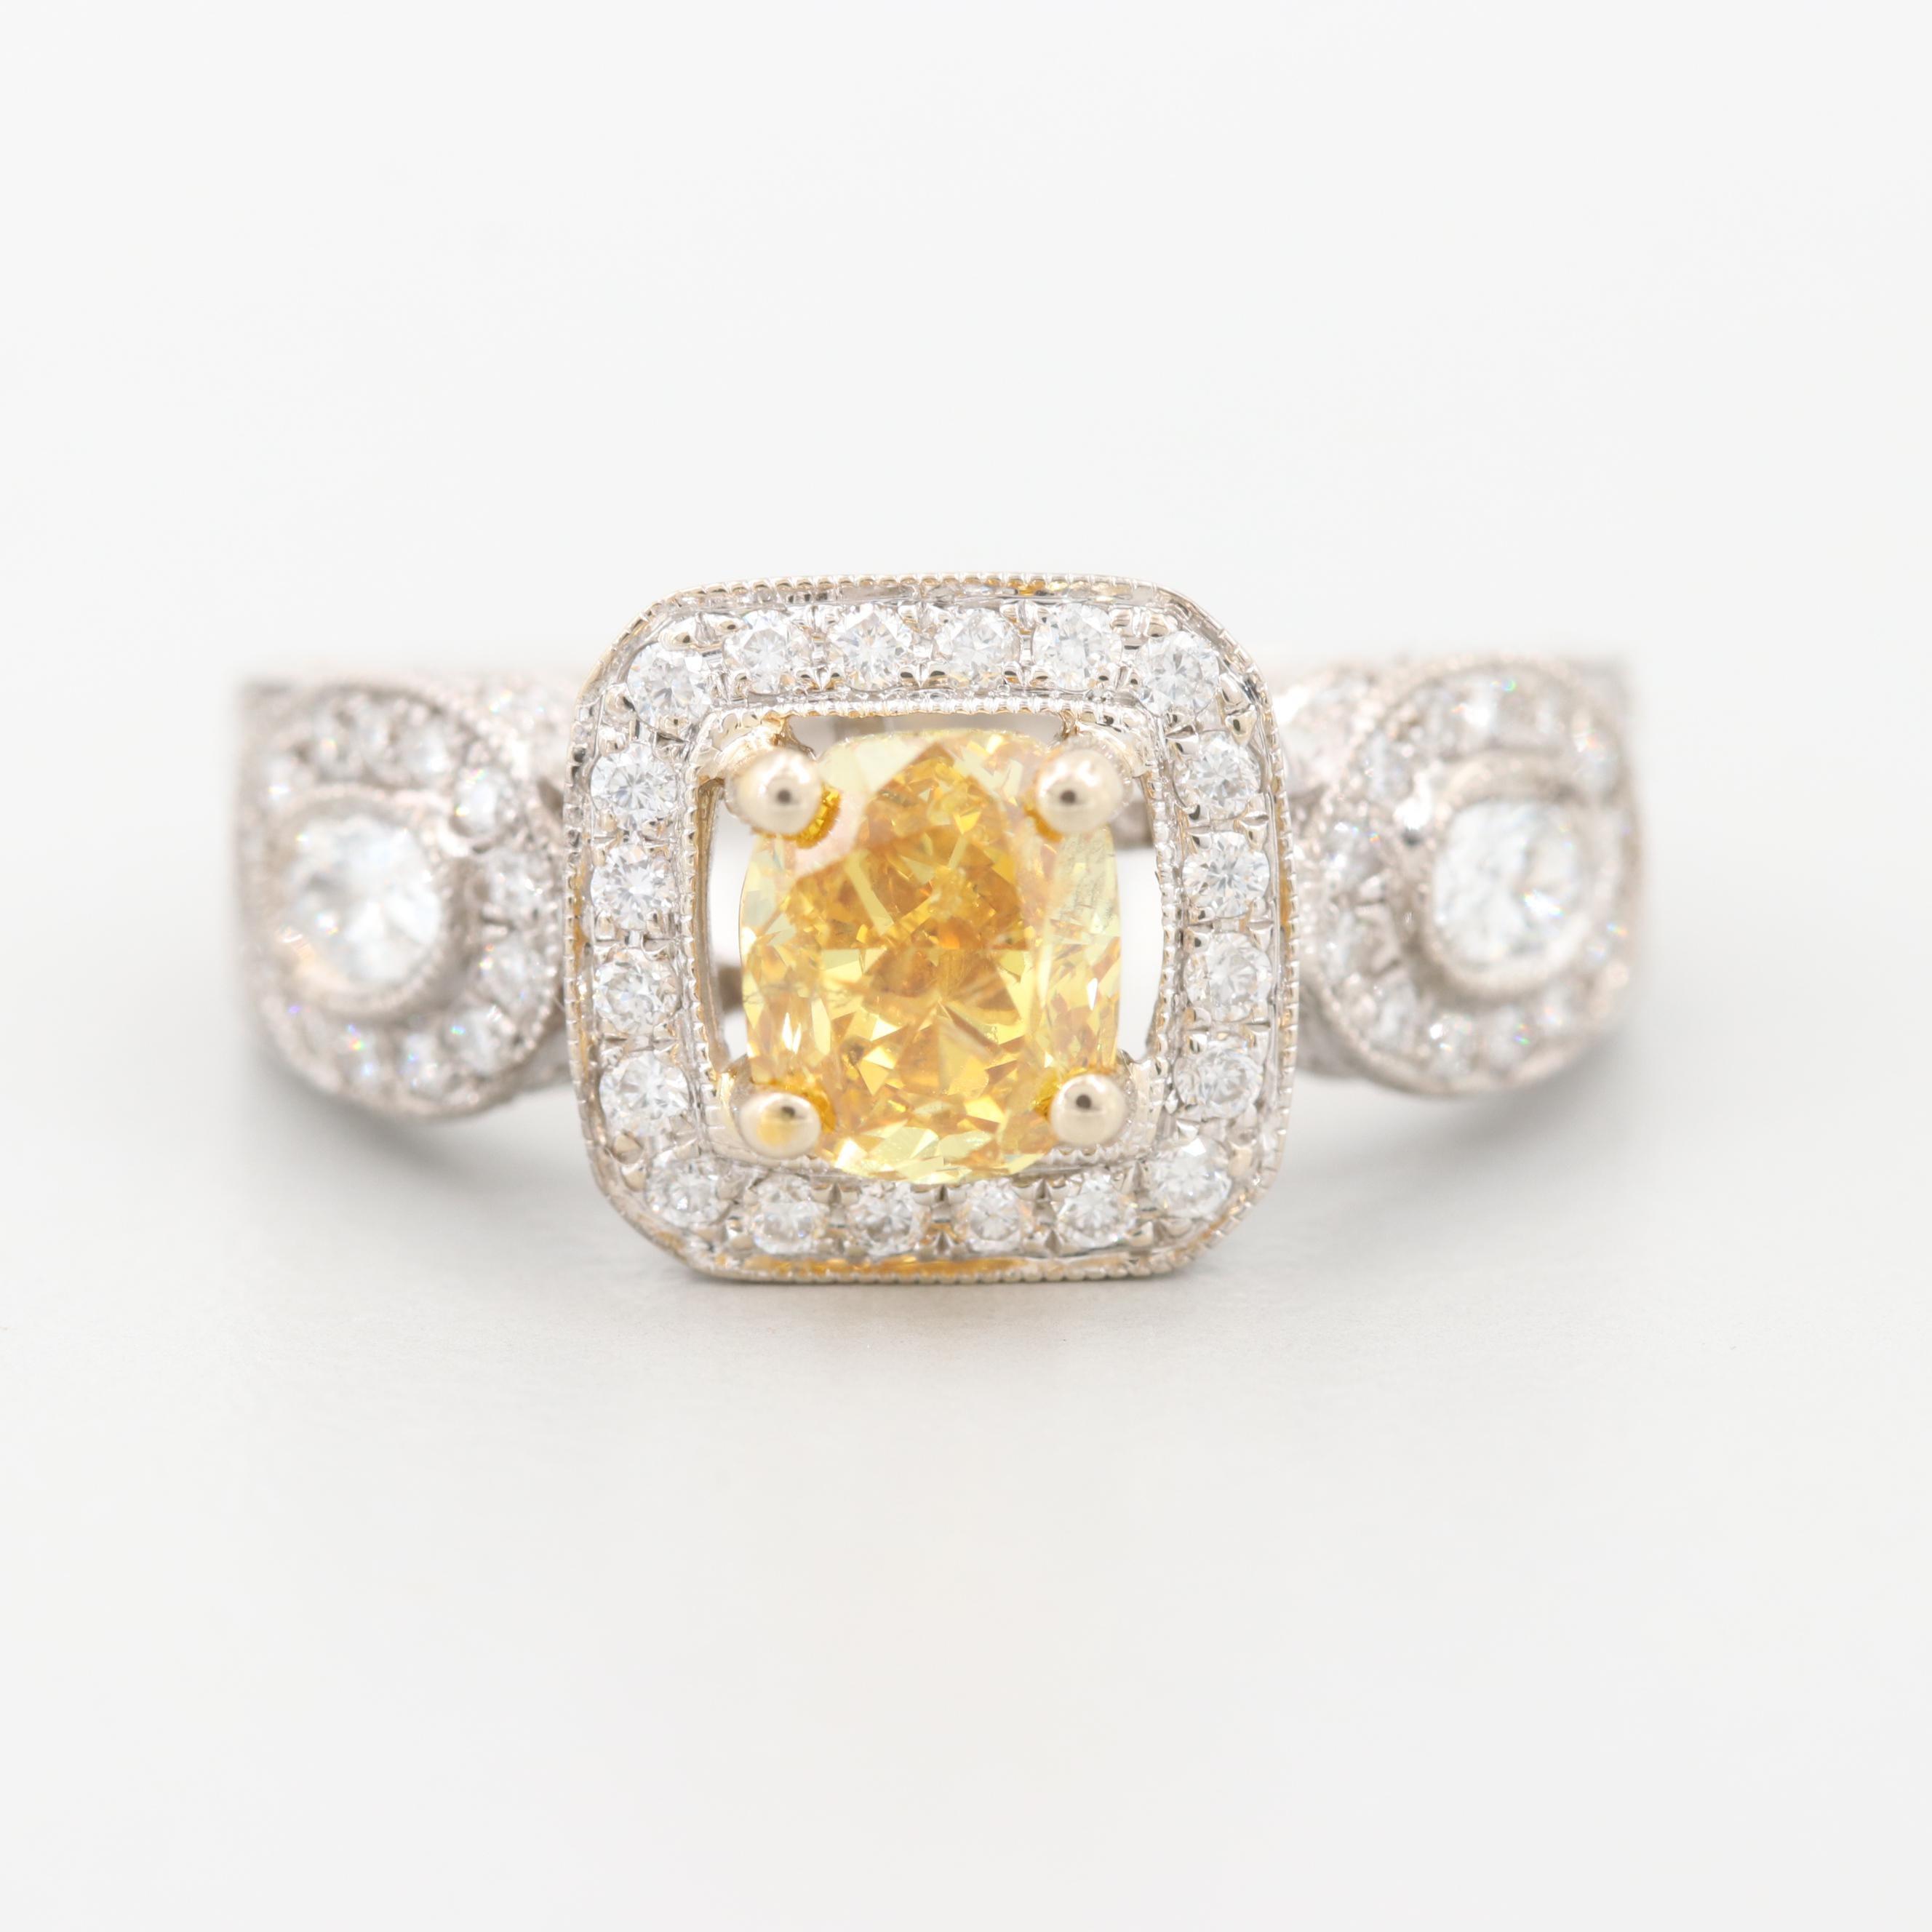 18K White Gold 2.24 CTW Fancy Intense Orangy Yellow Diamond Ring GIA Report